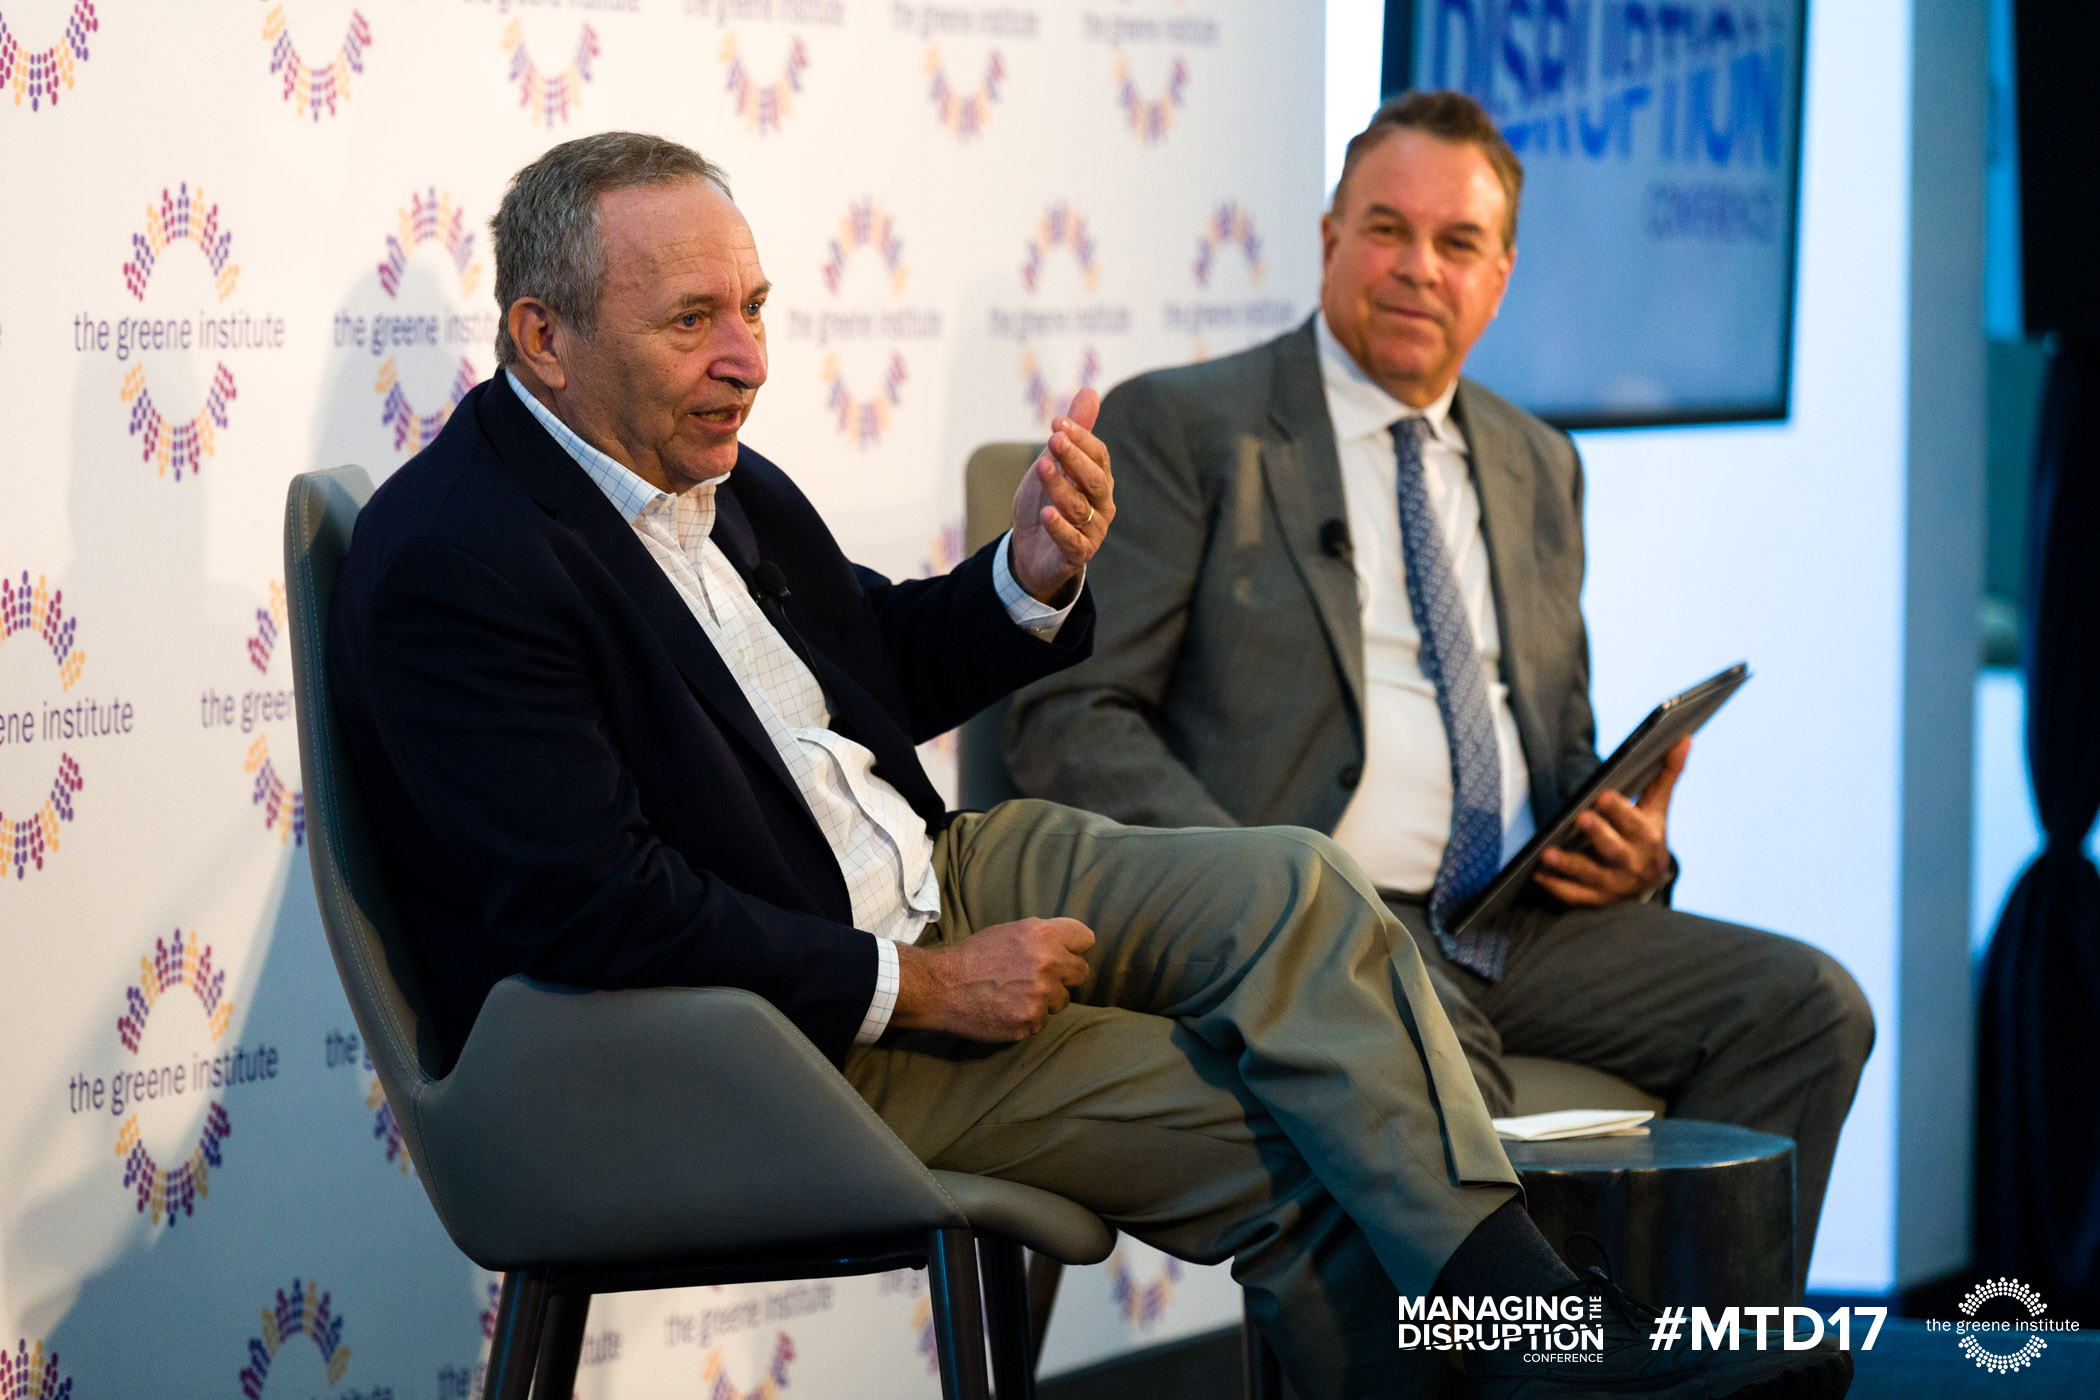 Jeff Greene (right) interviews Larry Summers